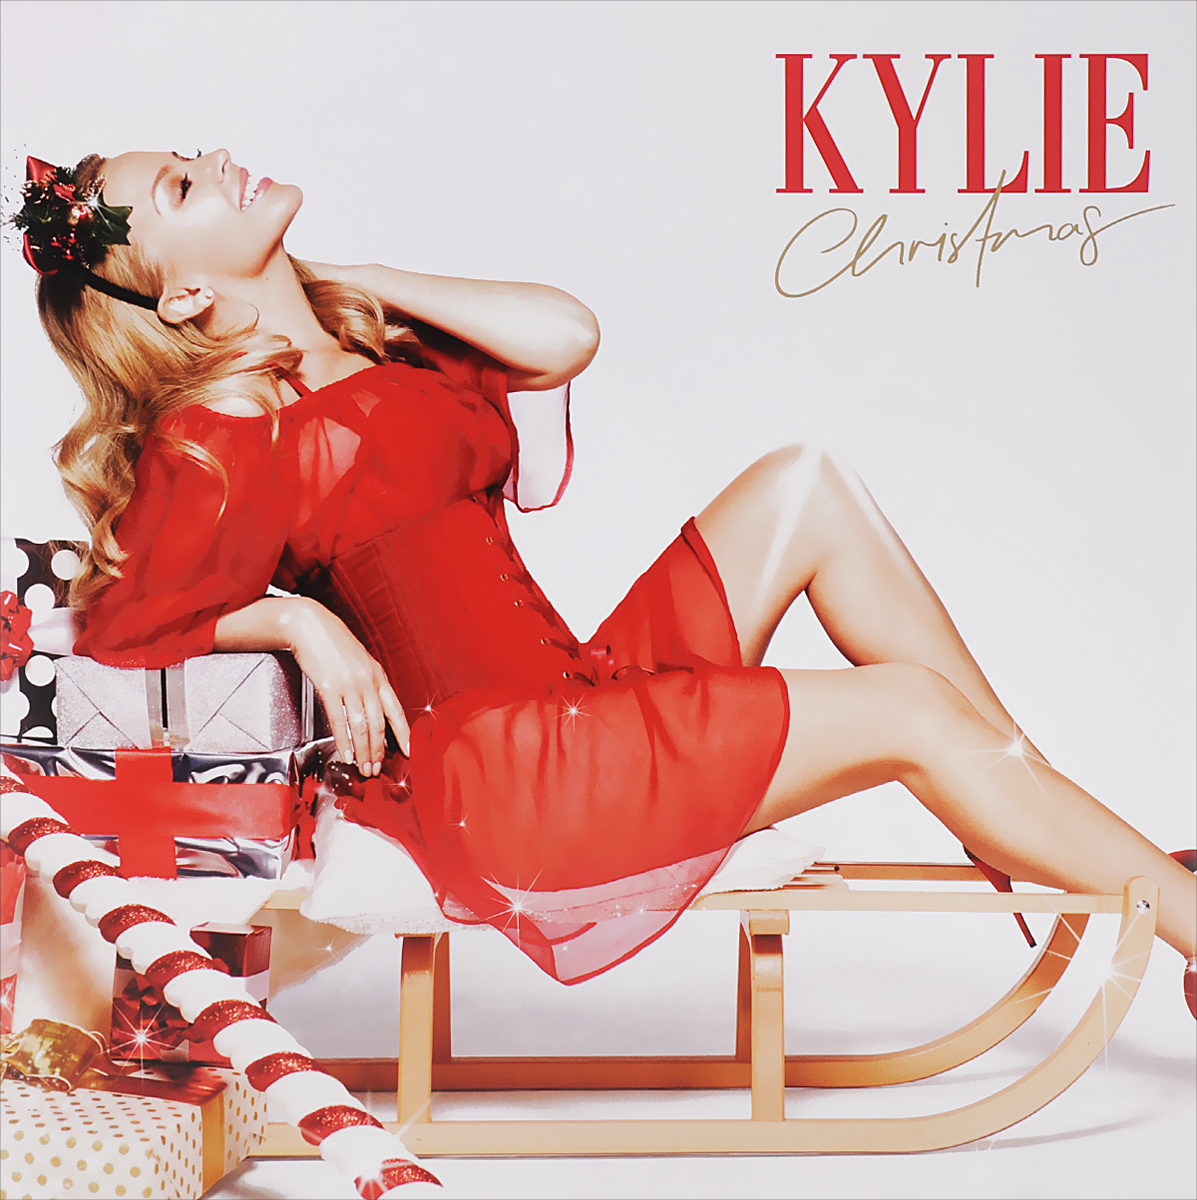 Kylie Kylie. Christmas (LP) кремы shemen amour крем shemen amour дневной увлажняющий с коллагеном 50 мл